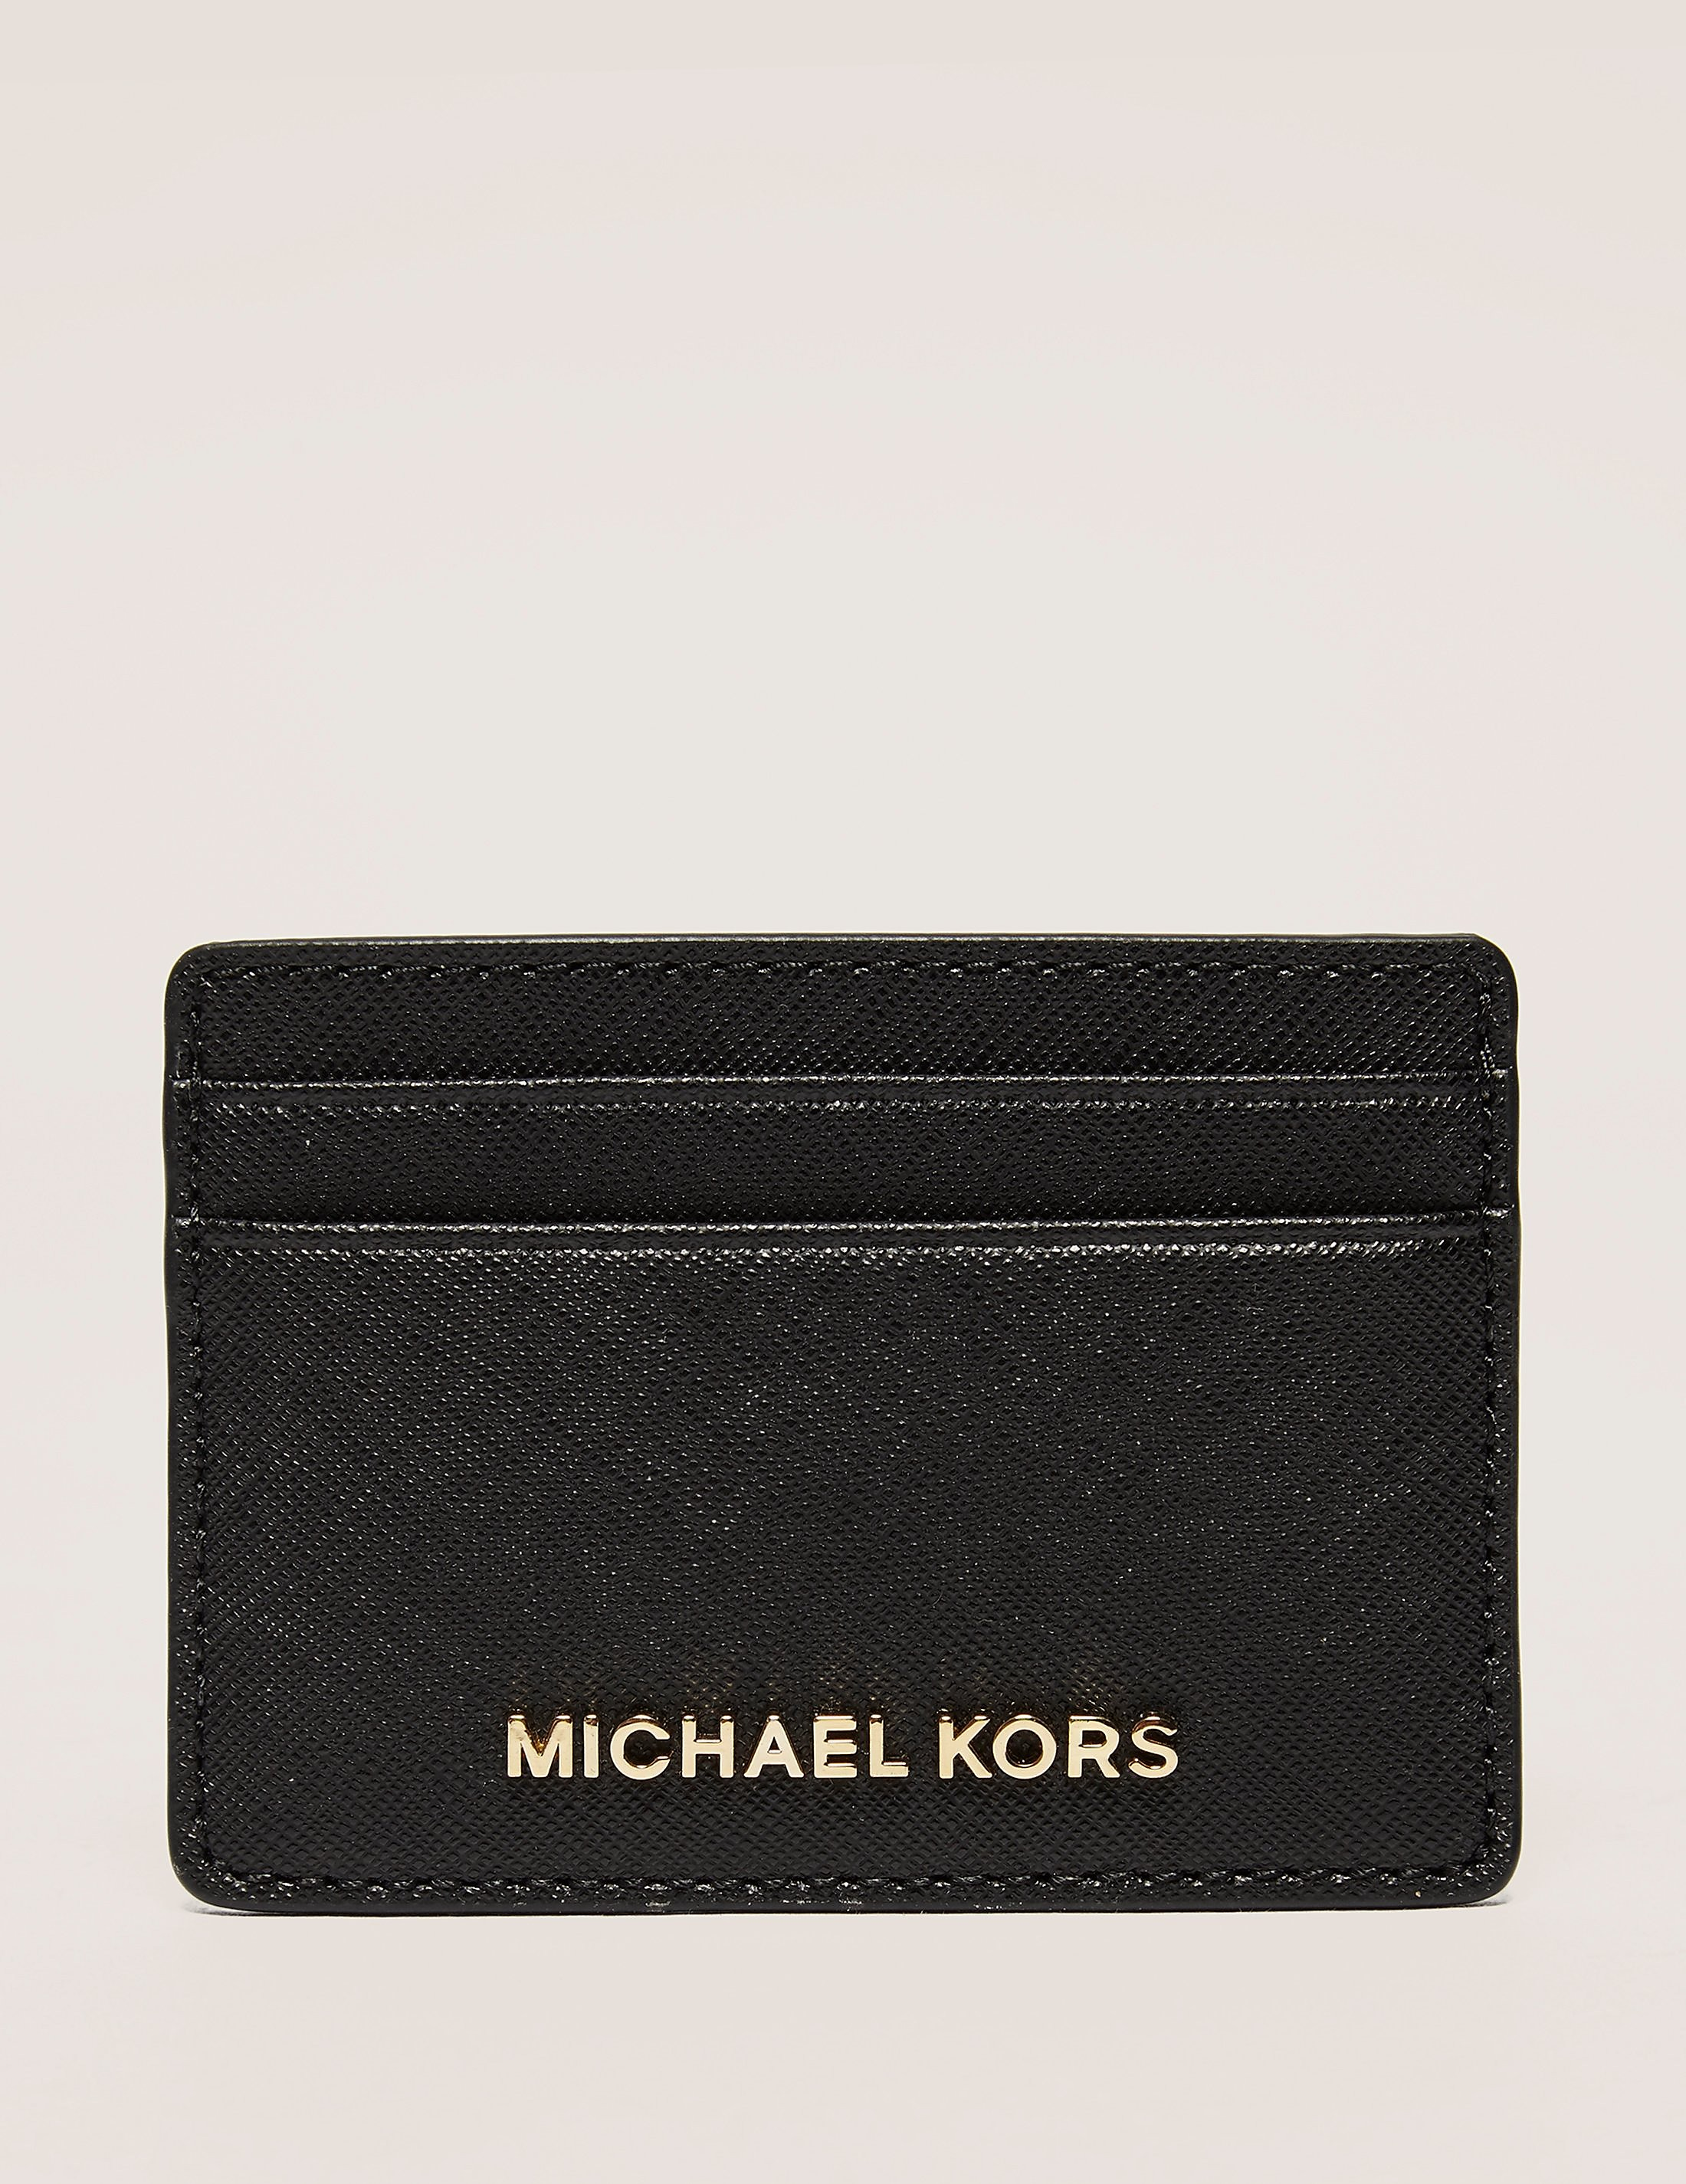 Michael Kors Jet Set Travel Leather Card Holder